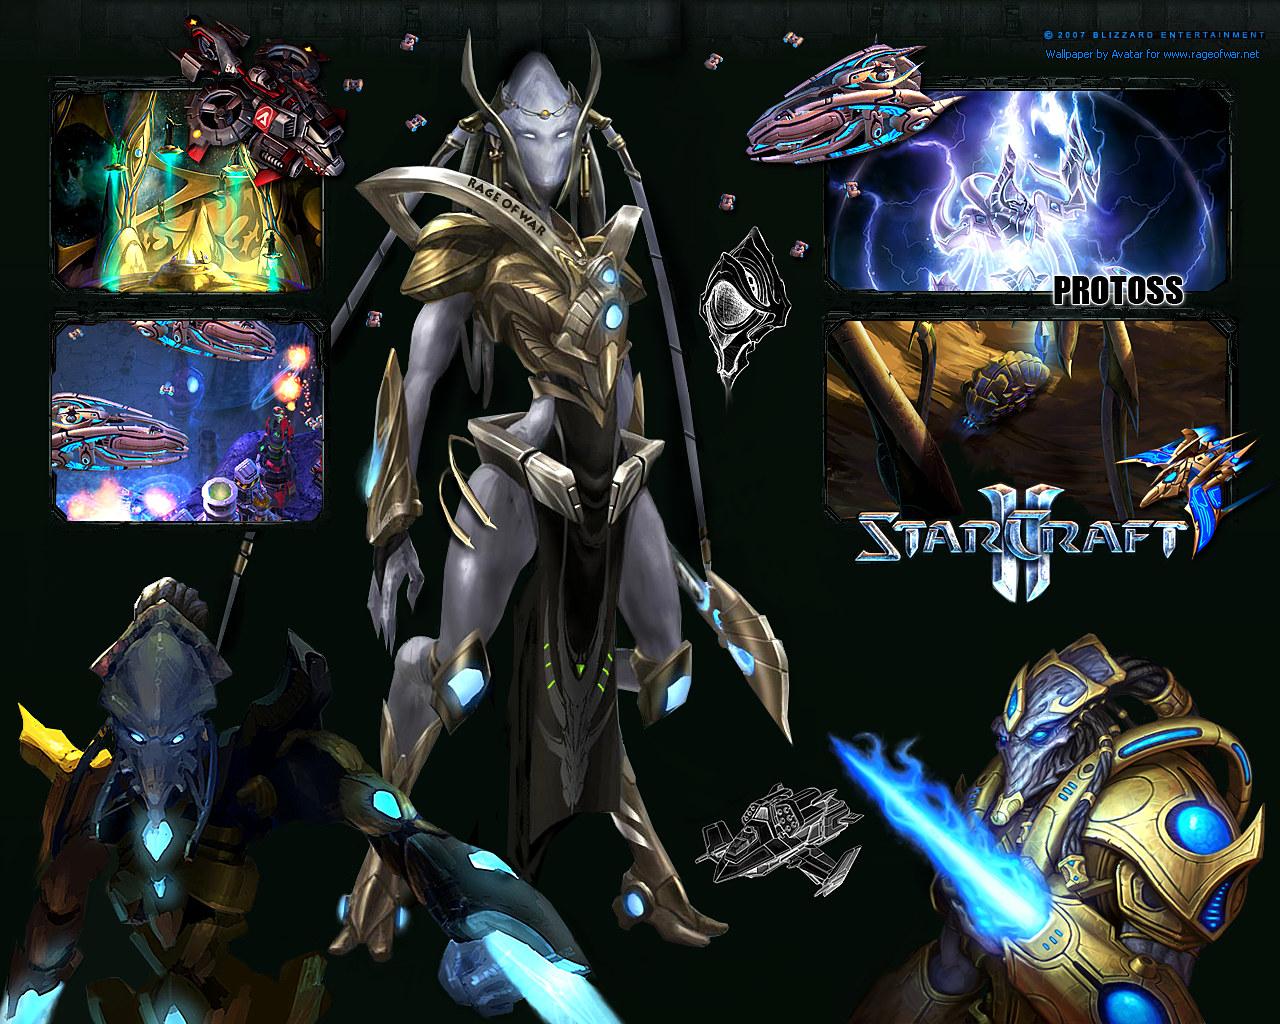 http://4.bp.blogspot.com/_EN40KBIbSJI/TE0b9KkkoPI/AAAAAAAAAAM/FAjXgezHO9A/s1600/starcraft-2-wallpaper.jpg